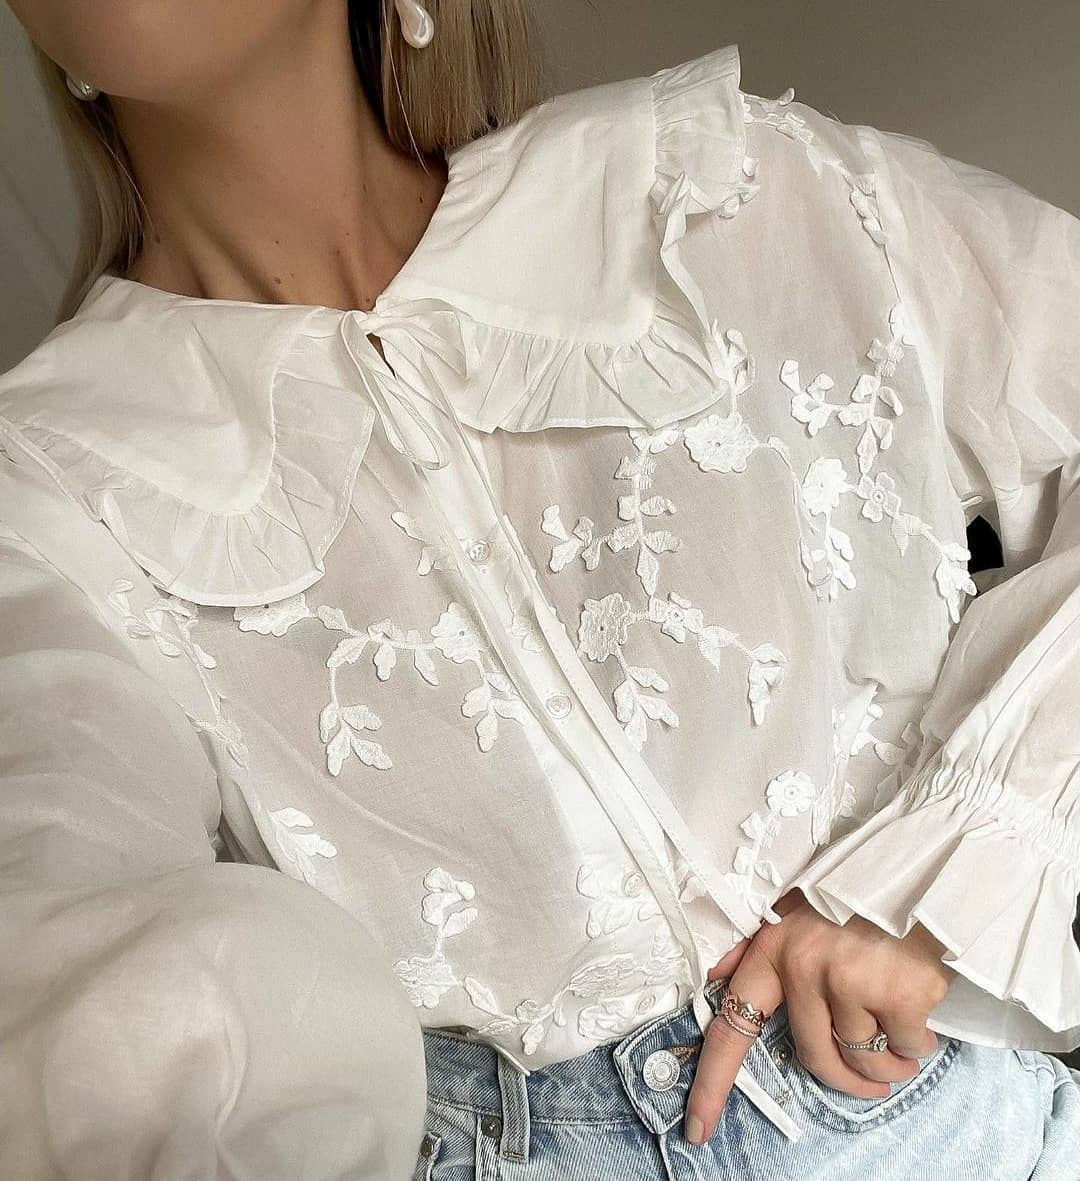 blouse ibiza de Mango sur mangooutfits